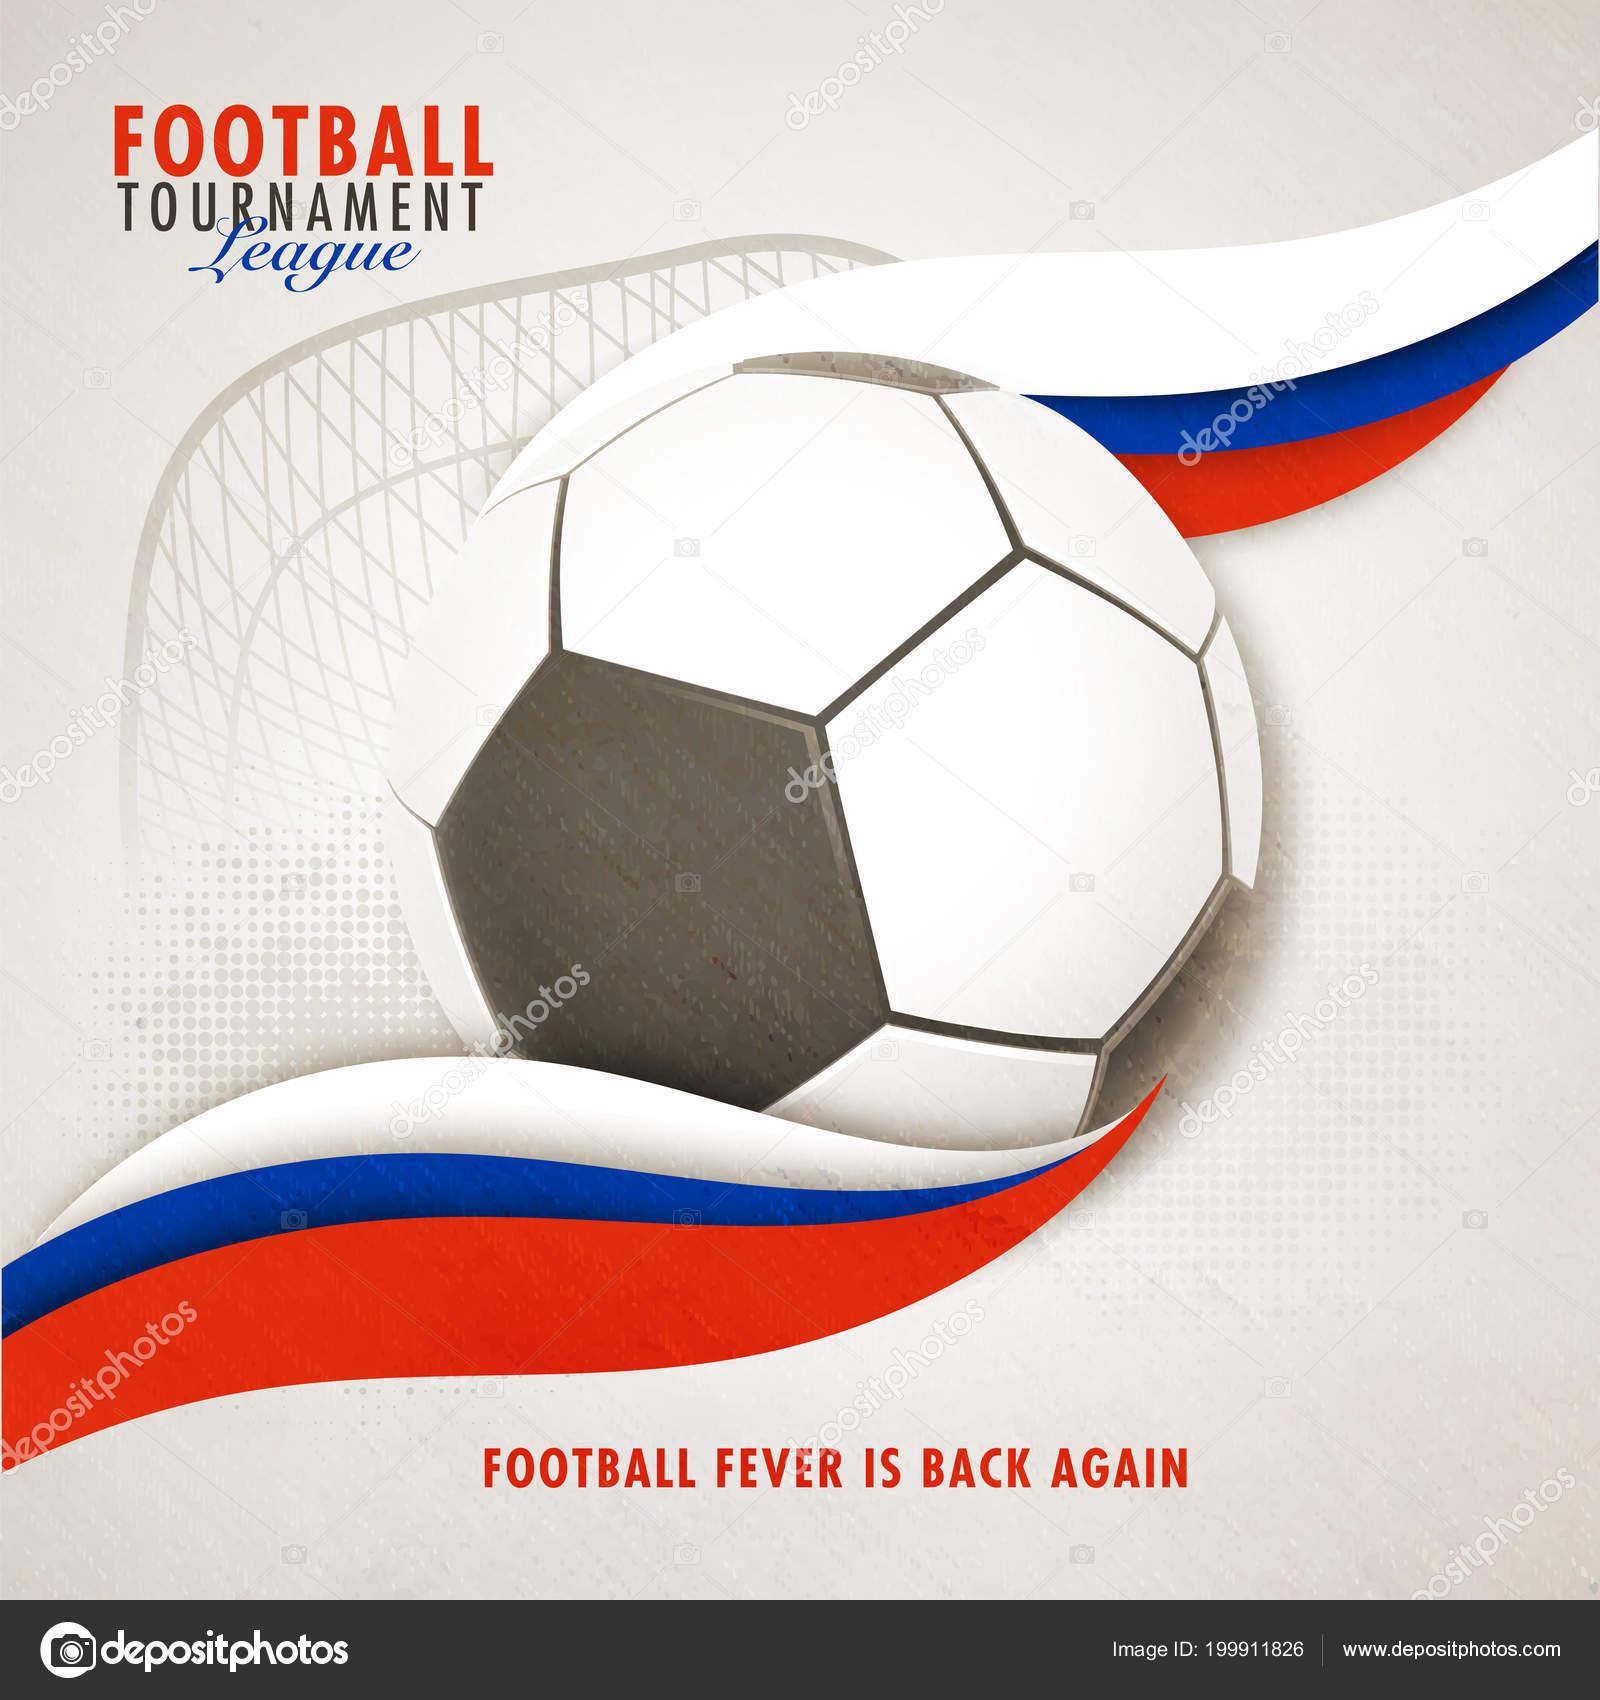 Football Tournament League Banner Poster Design Russian Flag Colors Waves Stock Vector C Alliesinteract 199911826